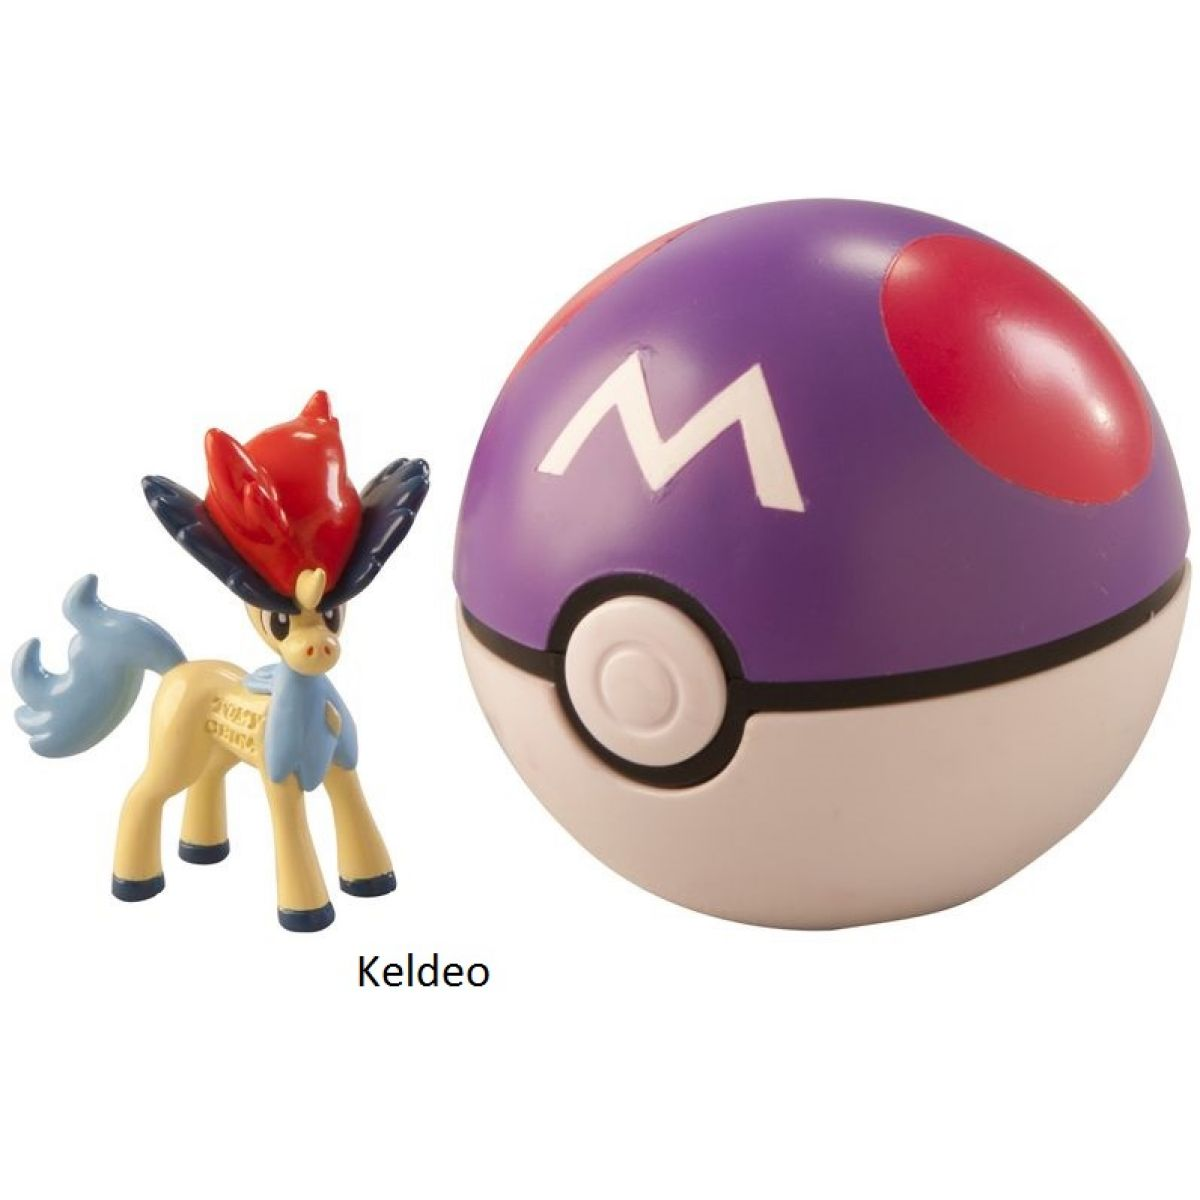 Pokémon Pokéball s figurkou - Keldeo